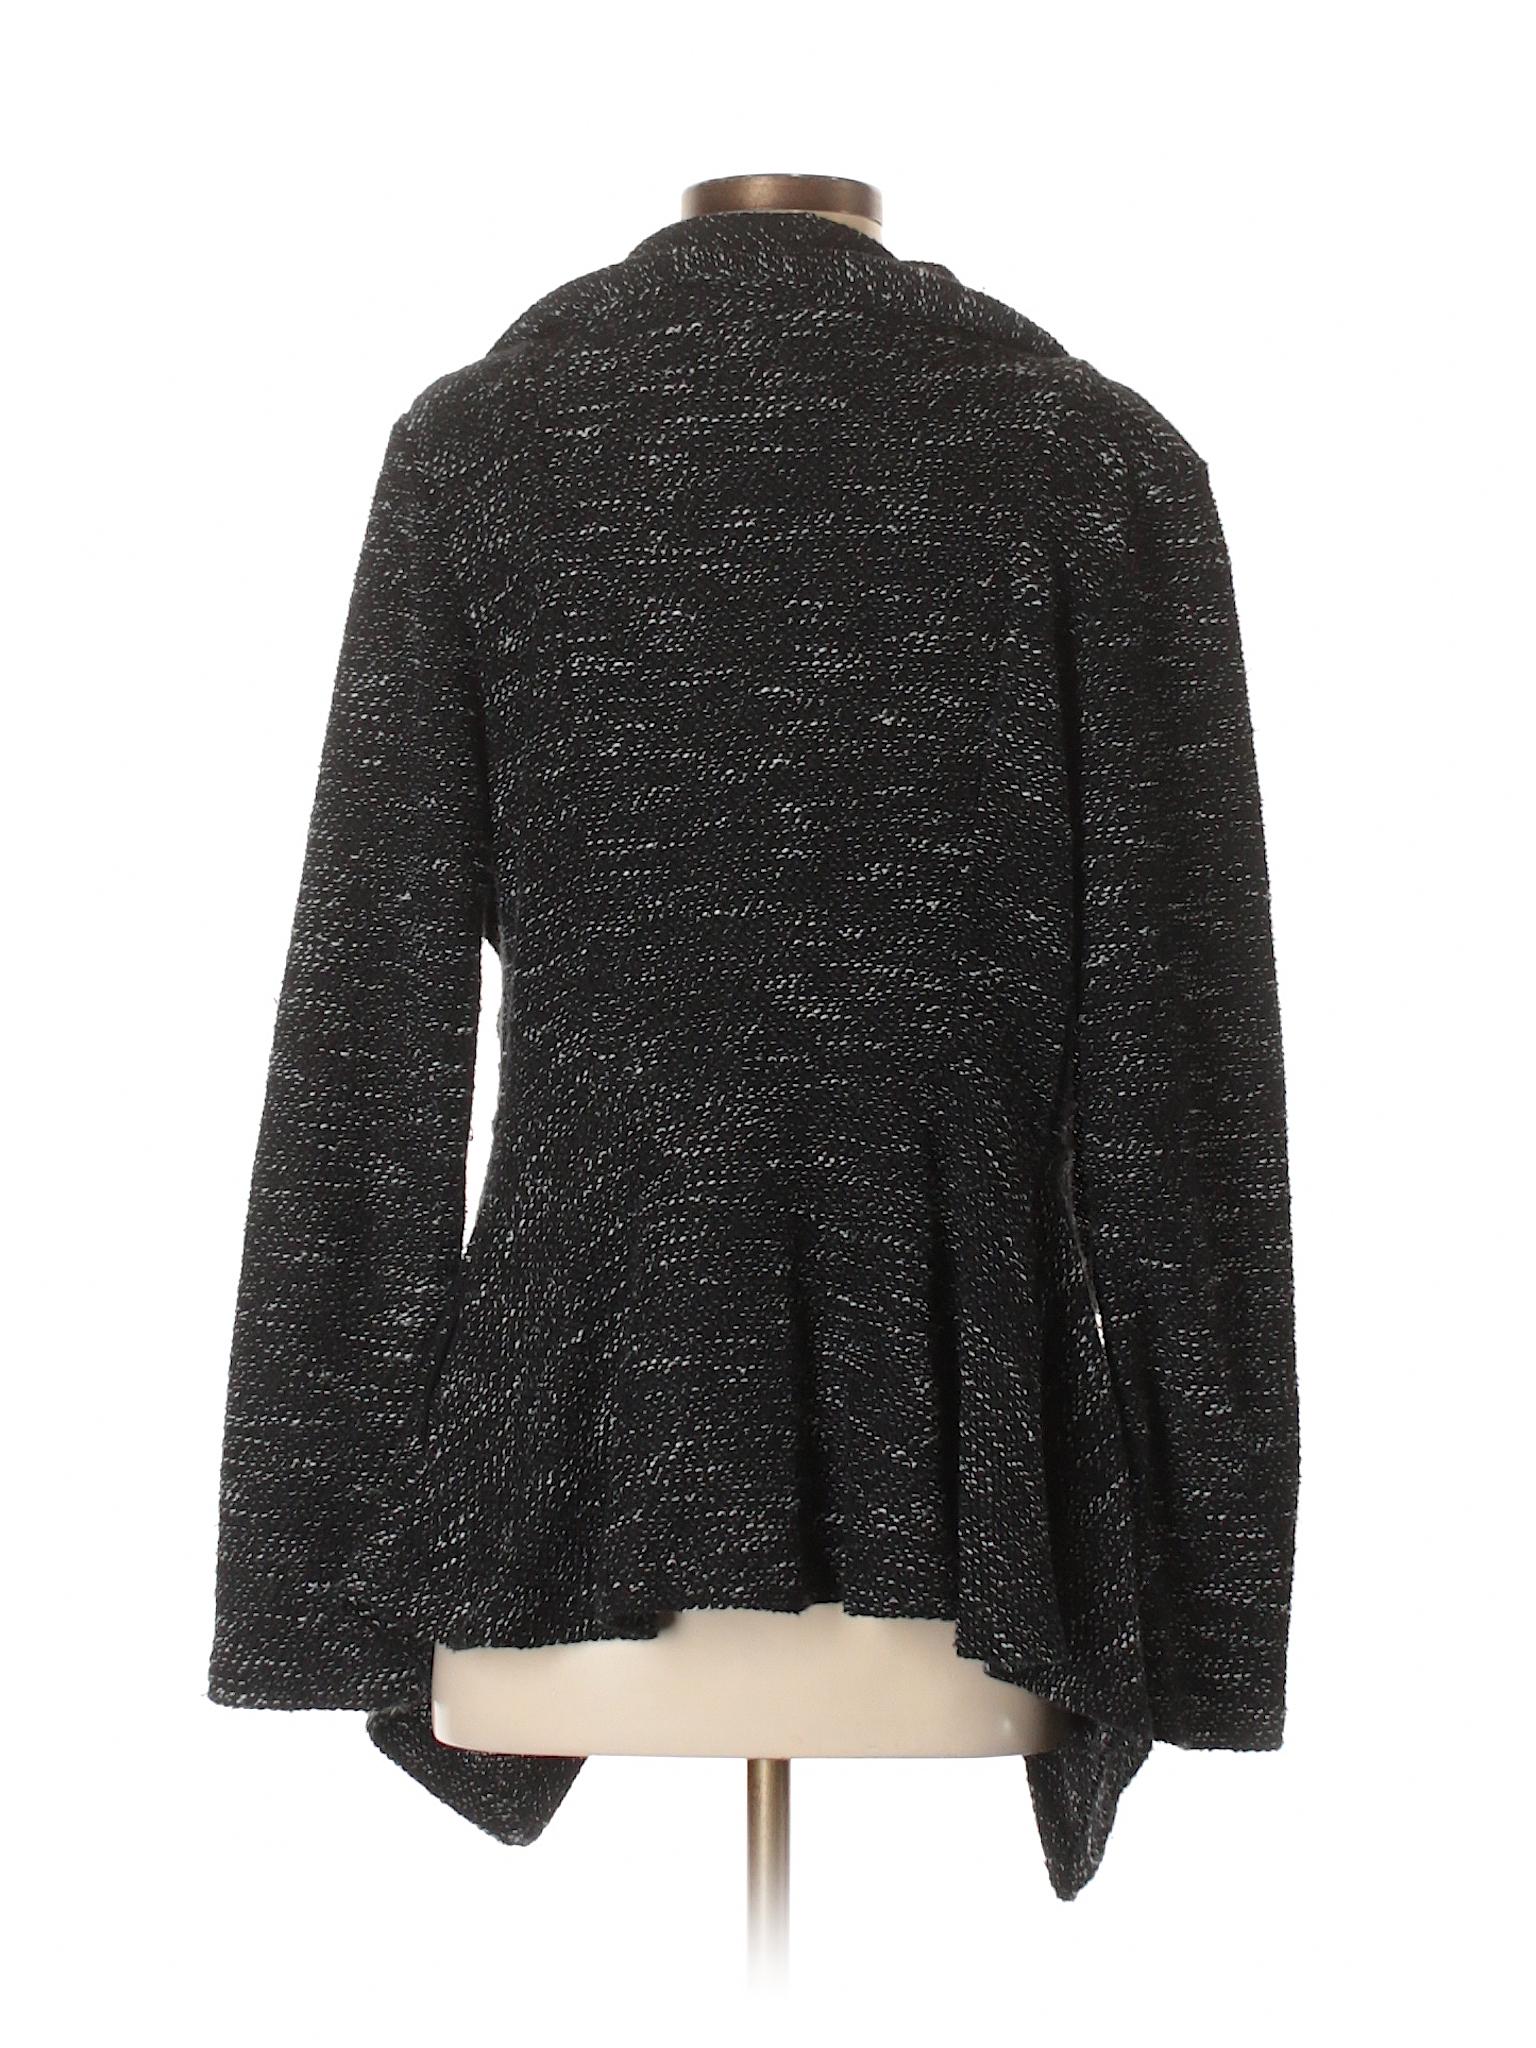 Noir Cardigan Blanc BNCI by Boutique winter q4IPBBwx